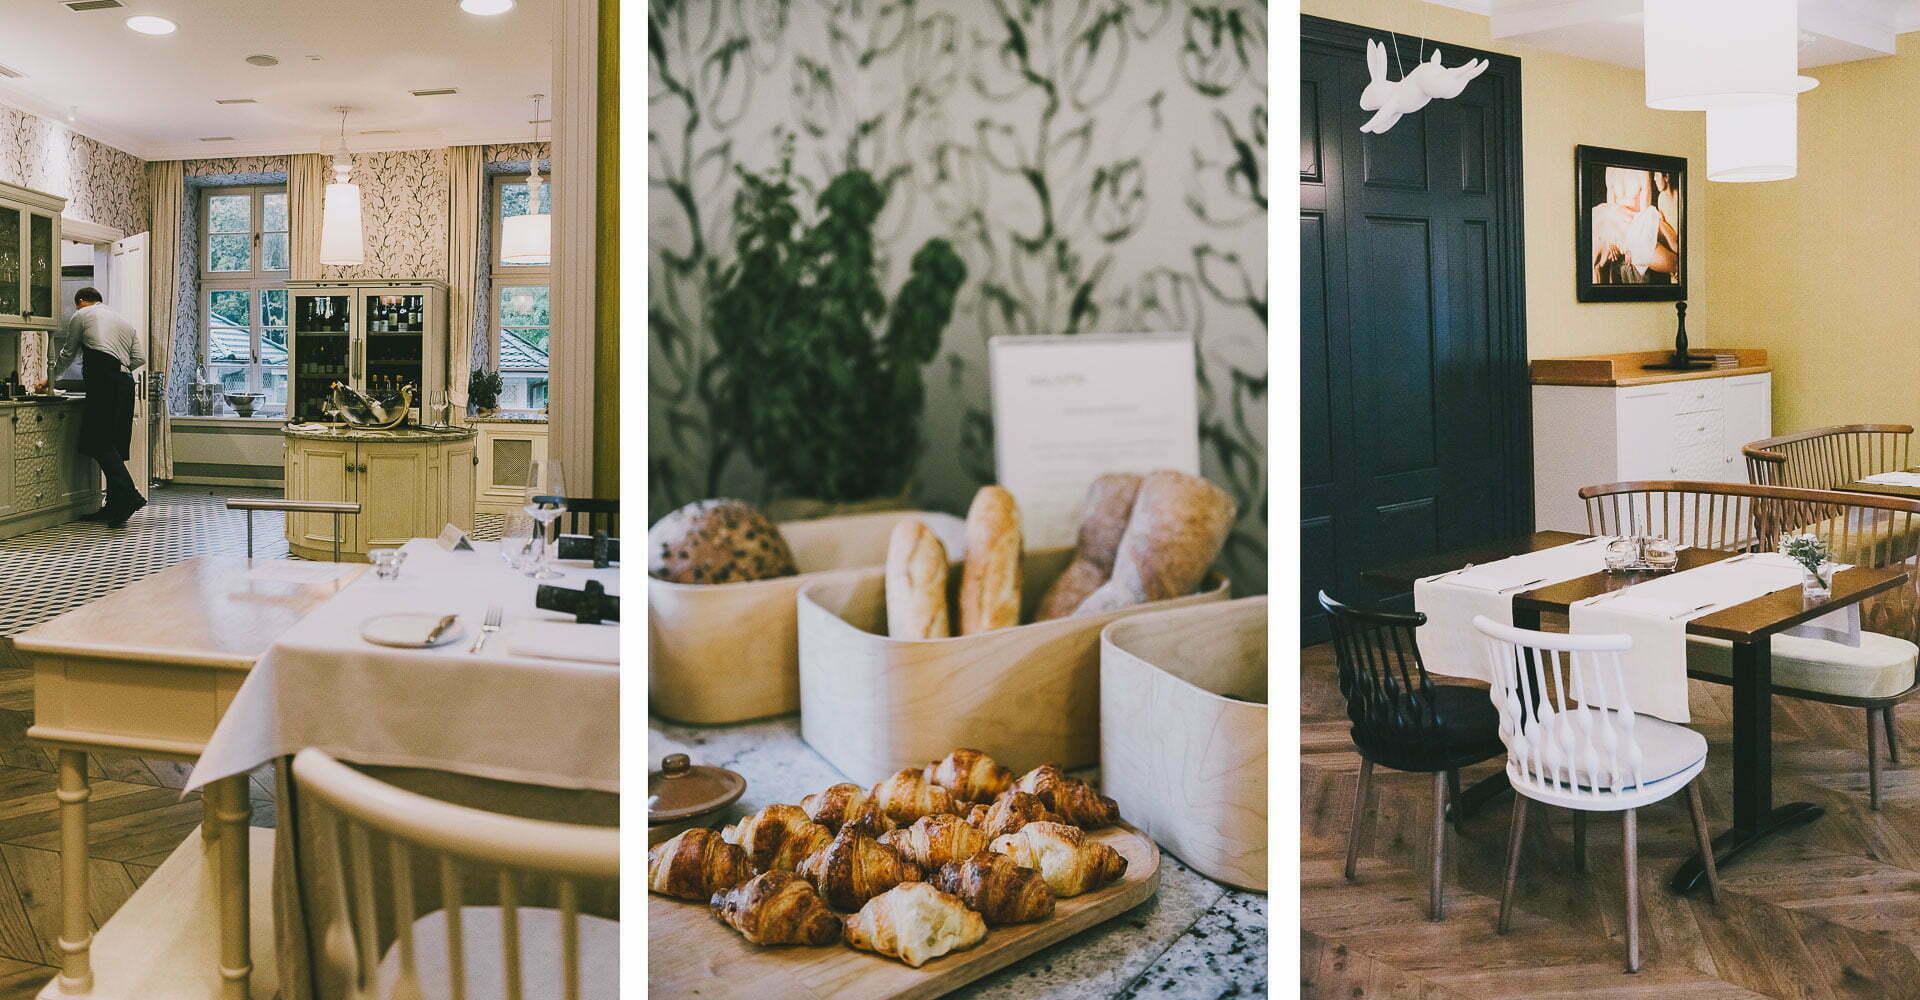 HOTEL QUADRILLE - Restauracja Biały Królik